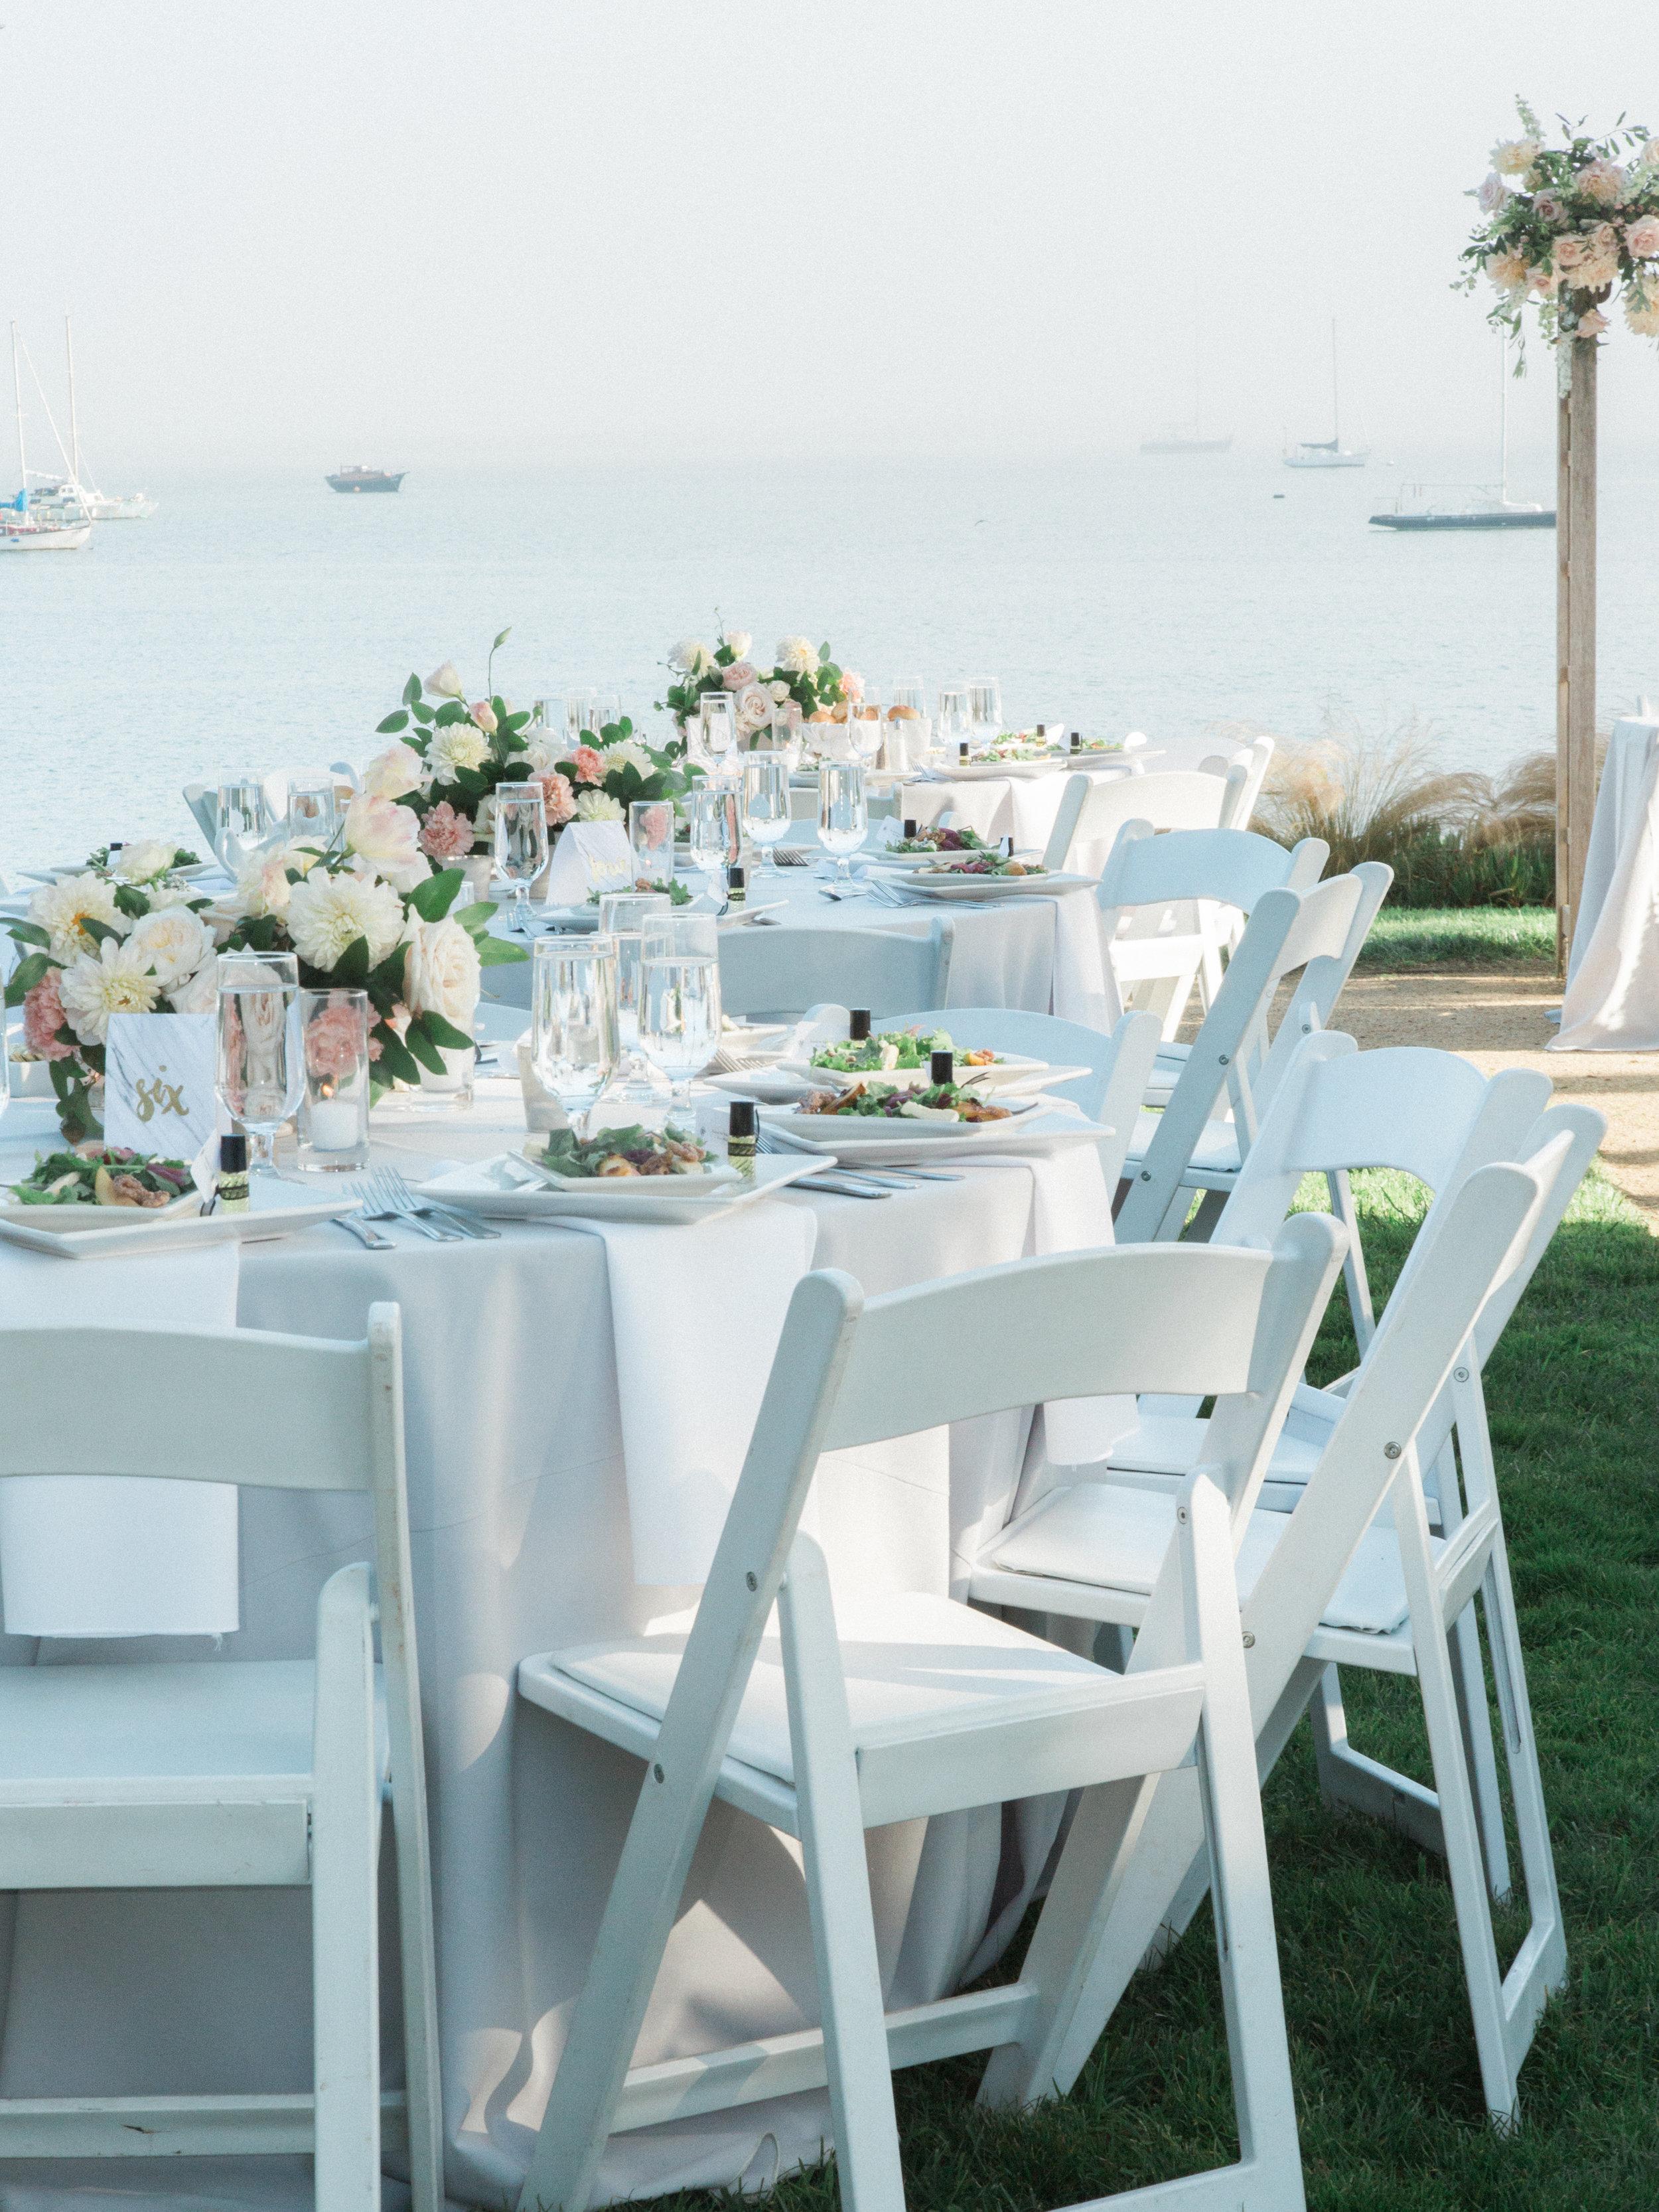 trynhphoto_socal_sf_halfmoon_bay_wedding_photographer_JA-445.jpg